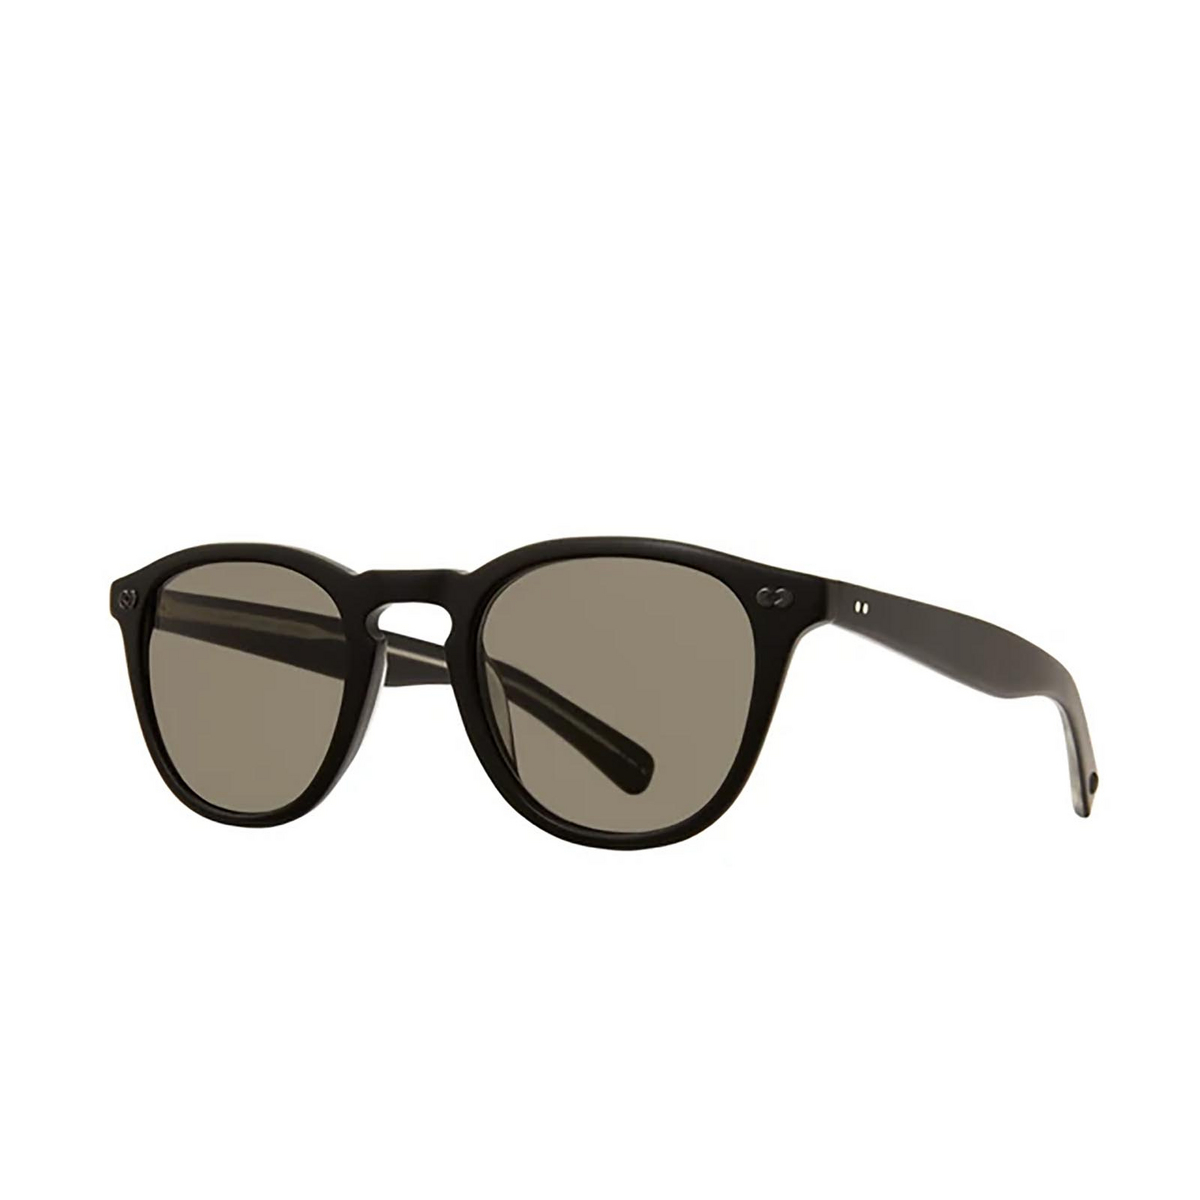 Garrett Leight® Square Sunglasses: Hampton X Sun color Matte Black Mbk/pgy.